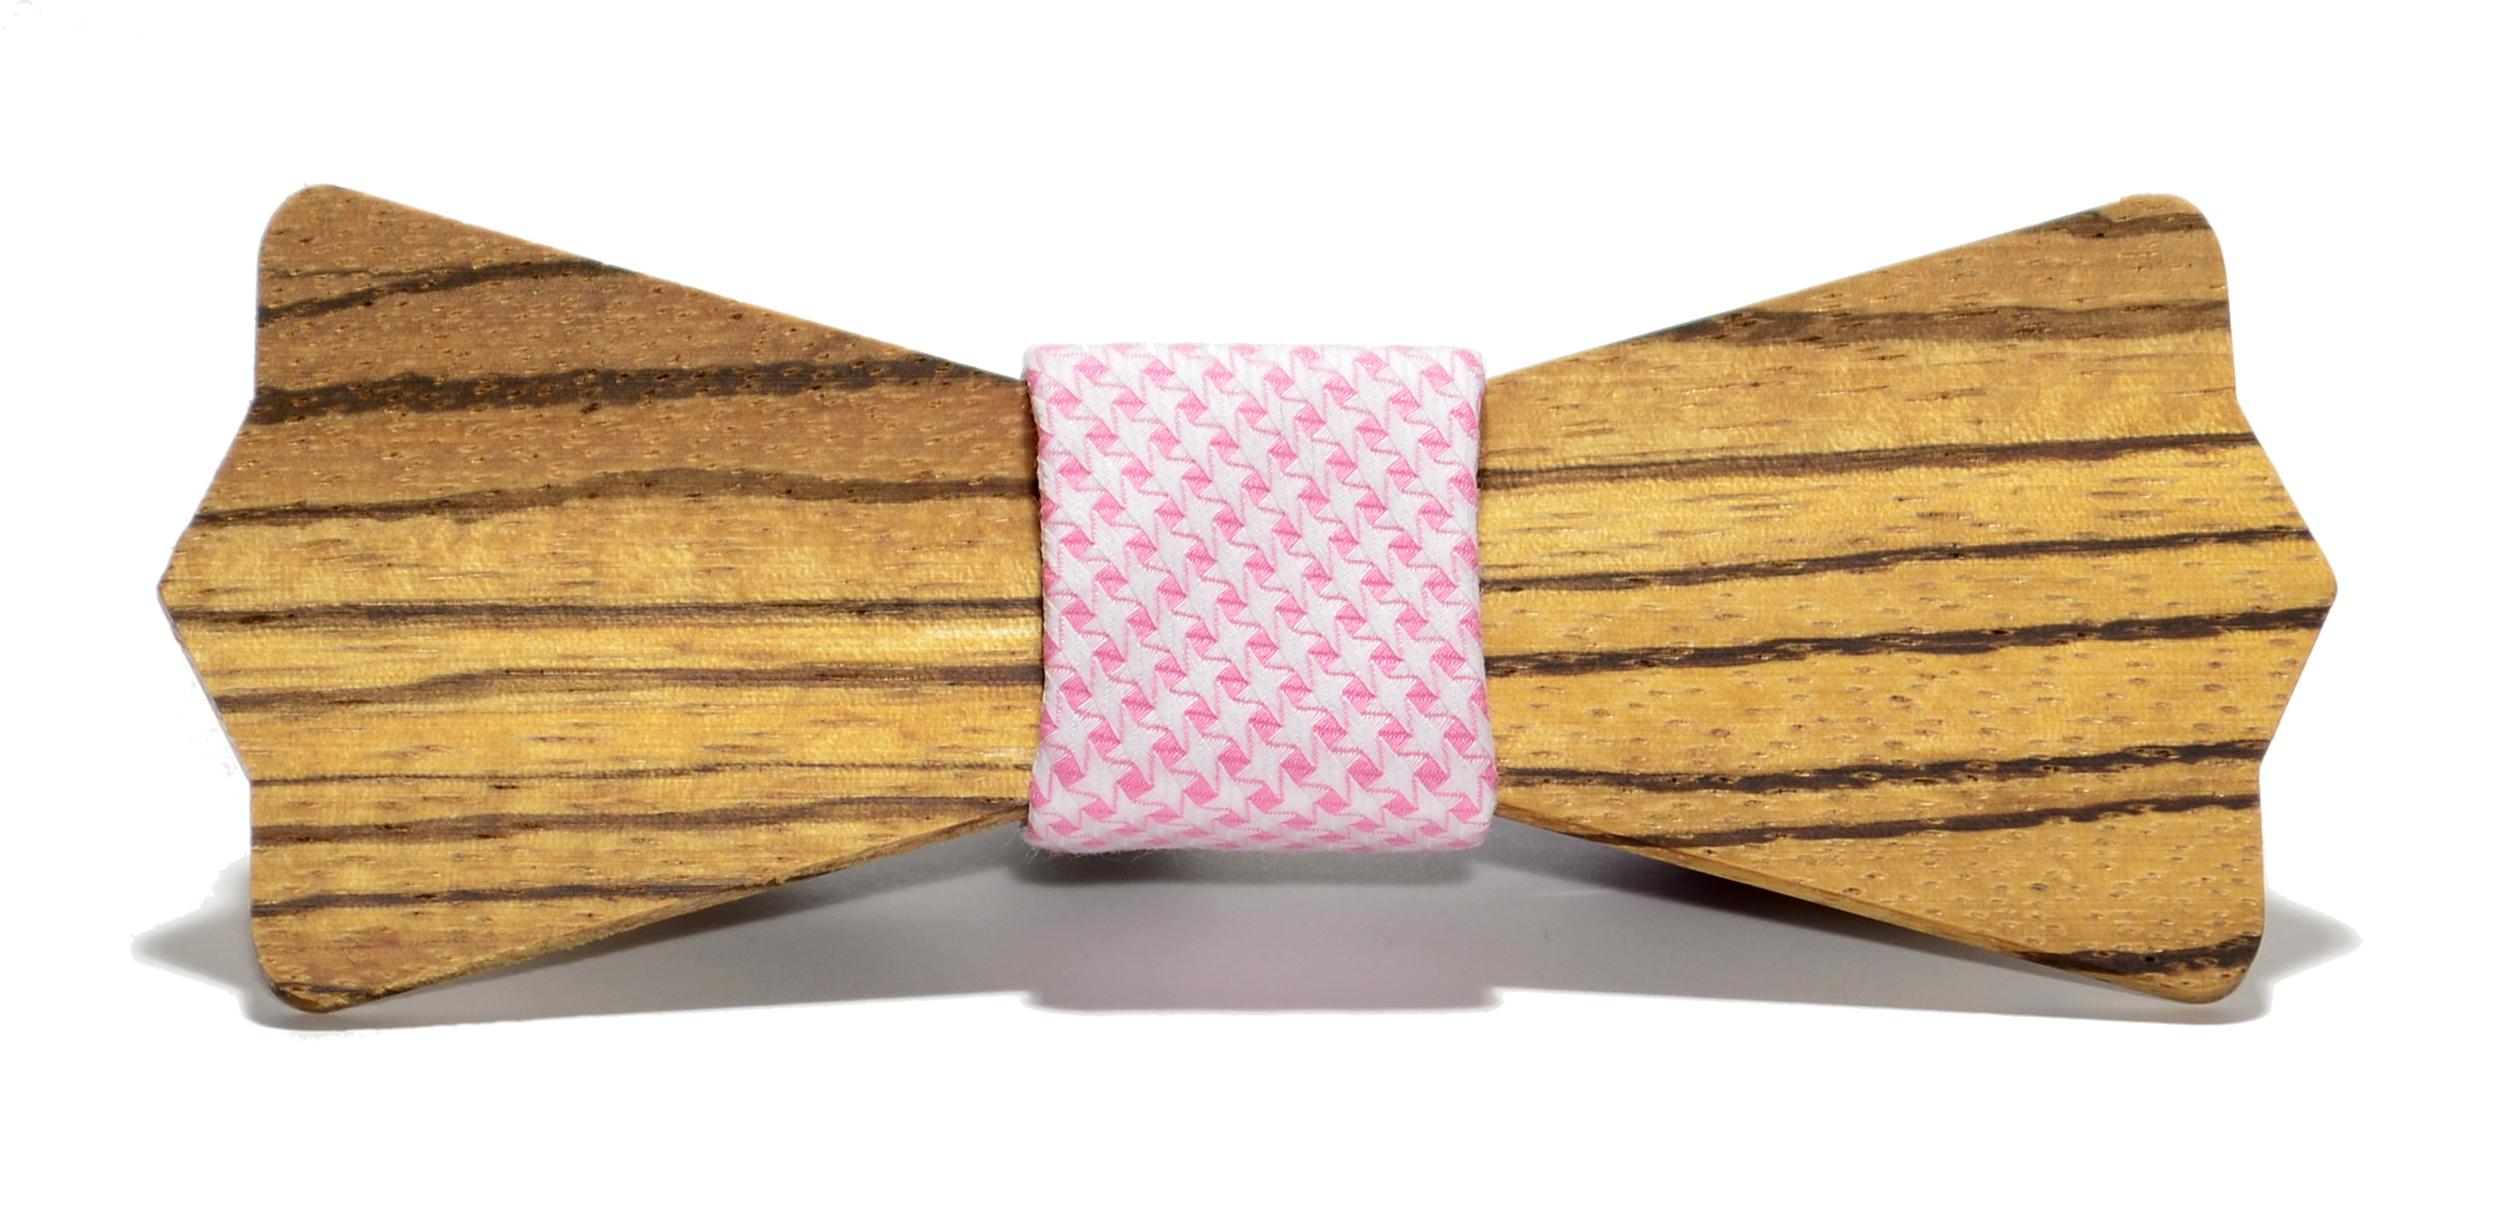 The Belmont Zebrawood Diamond Point Cotton Wooden Bow Tie